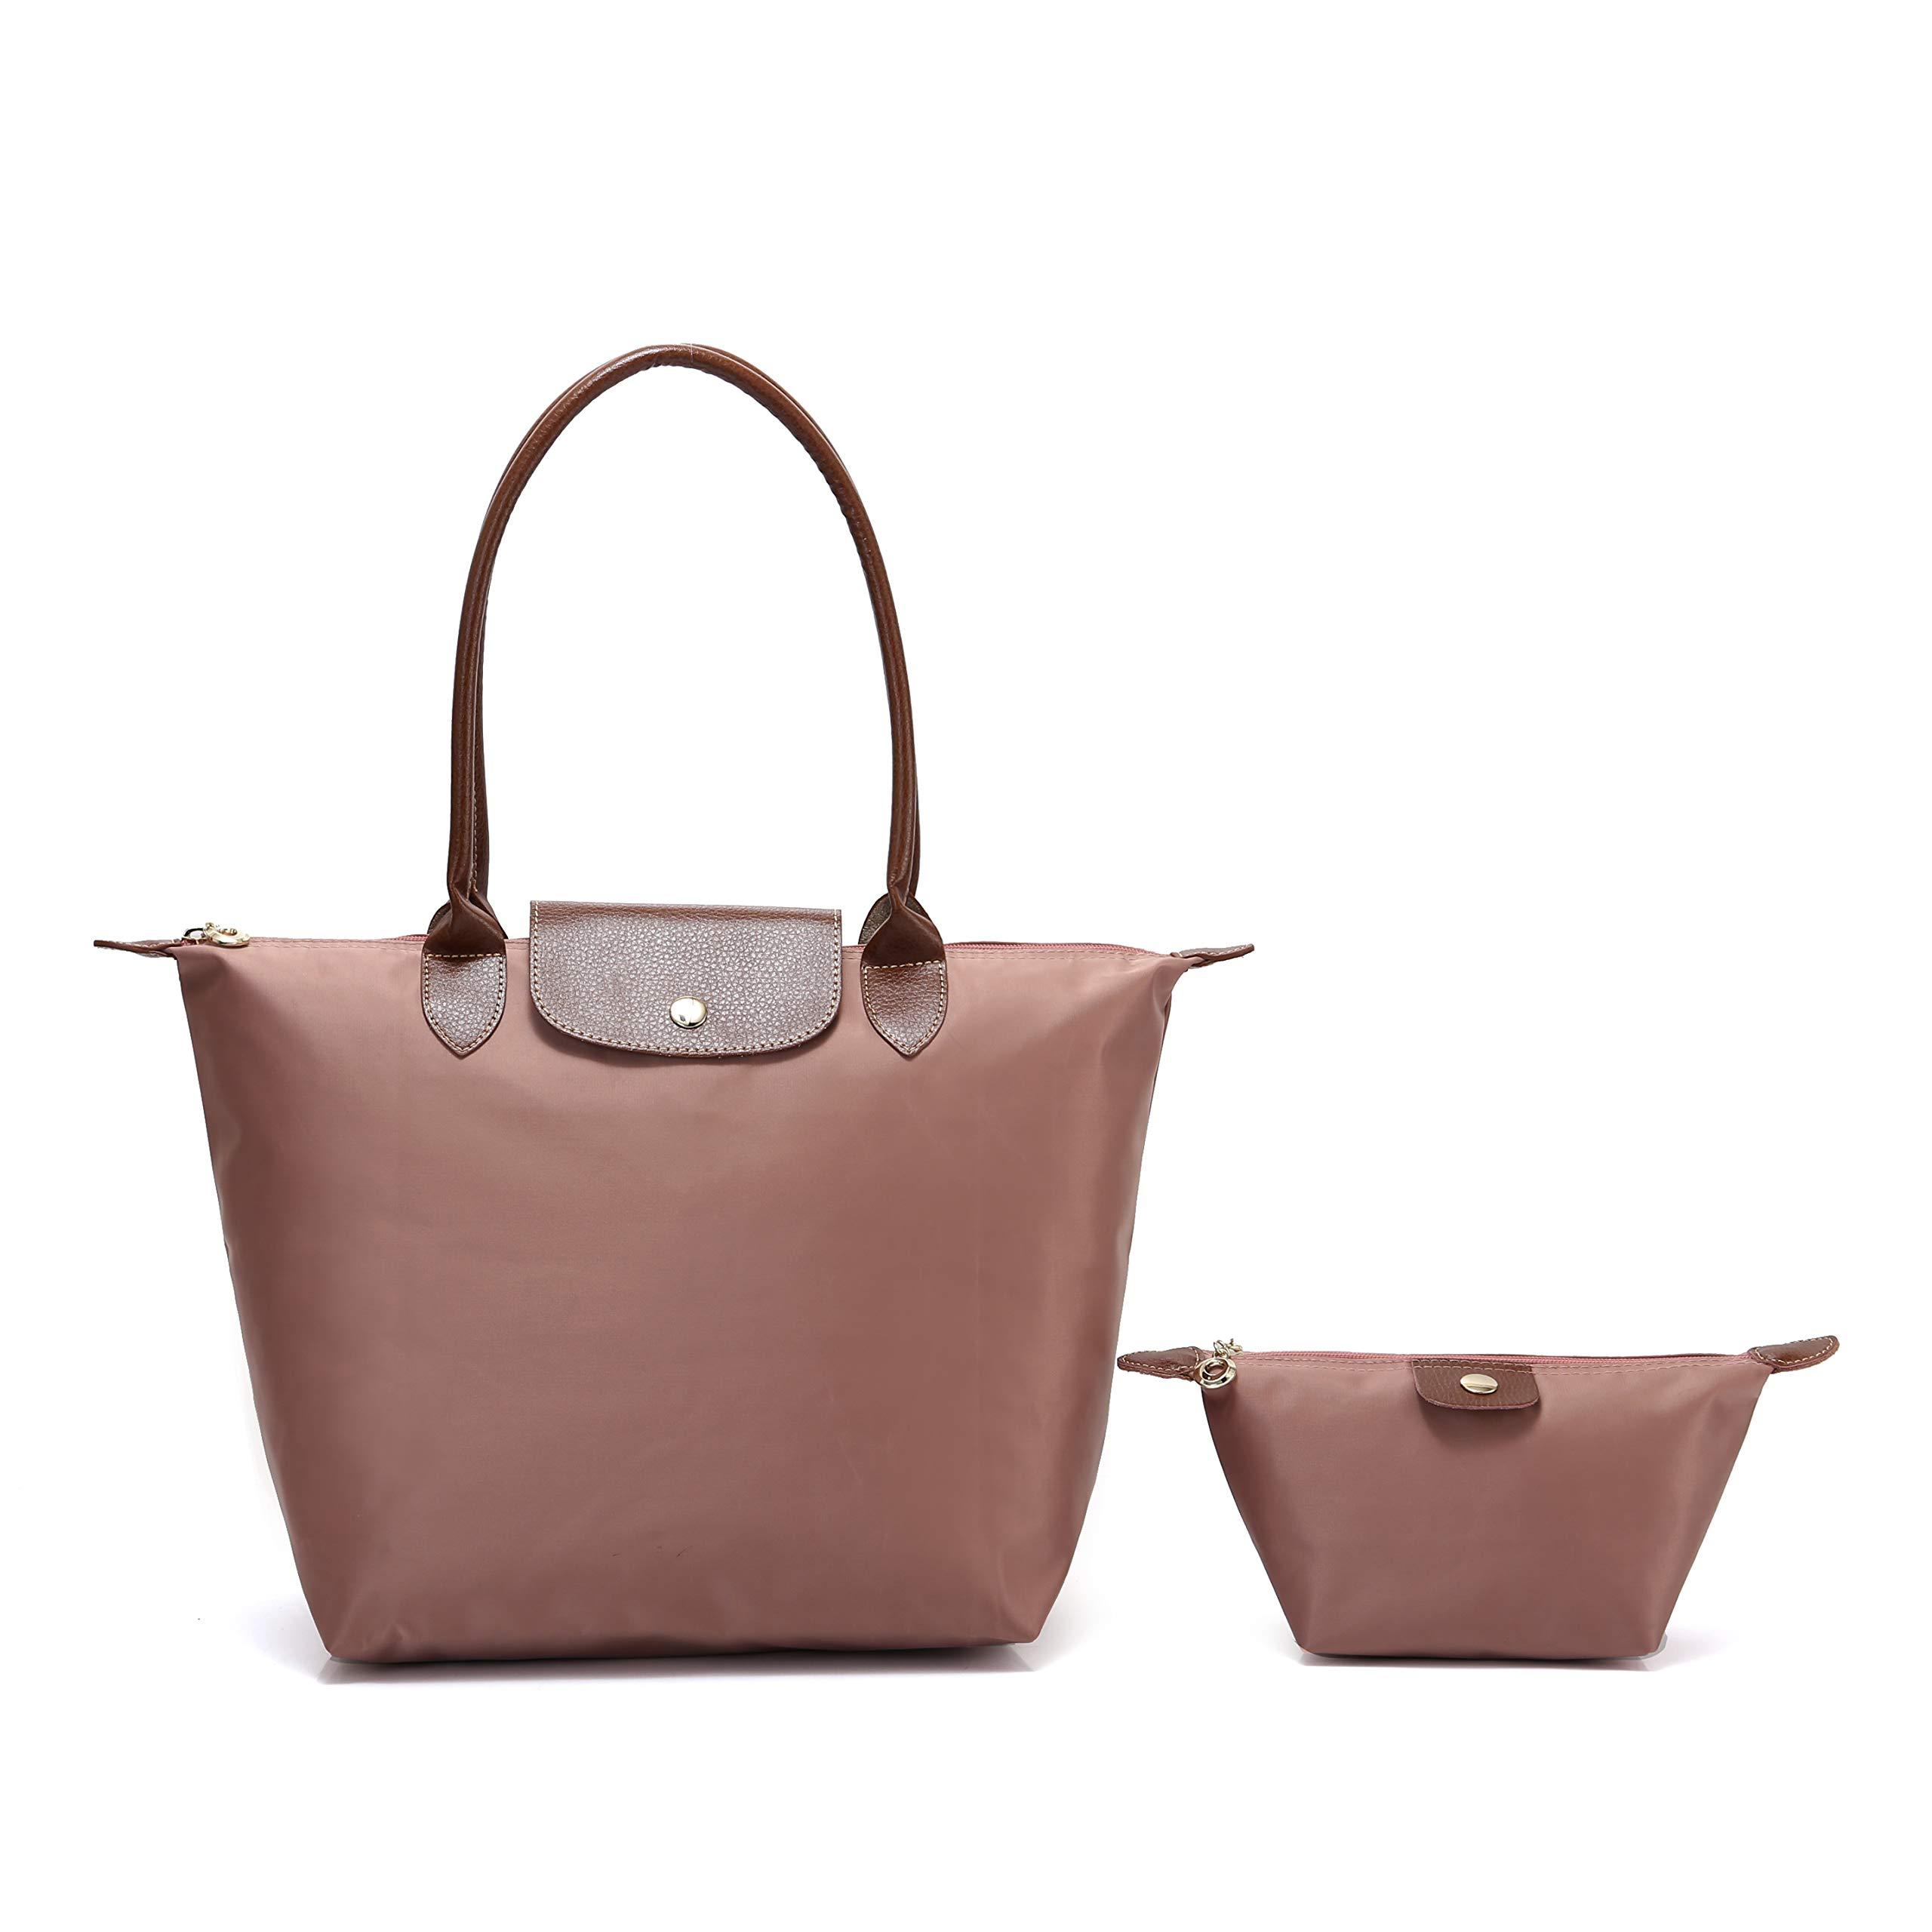 2 pcs Women's Stylish Waterproof Tote Bag Nylon Travel Shoulder Handbag (Pink, Medium)